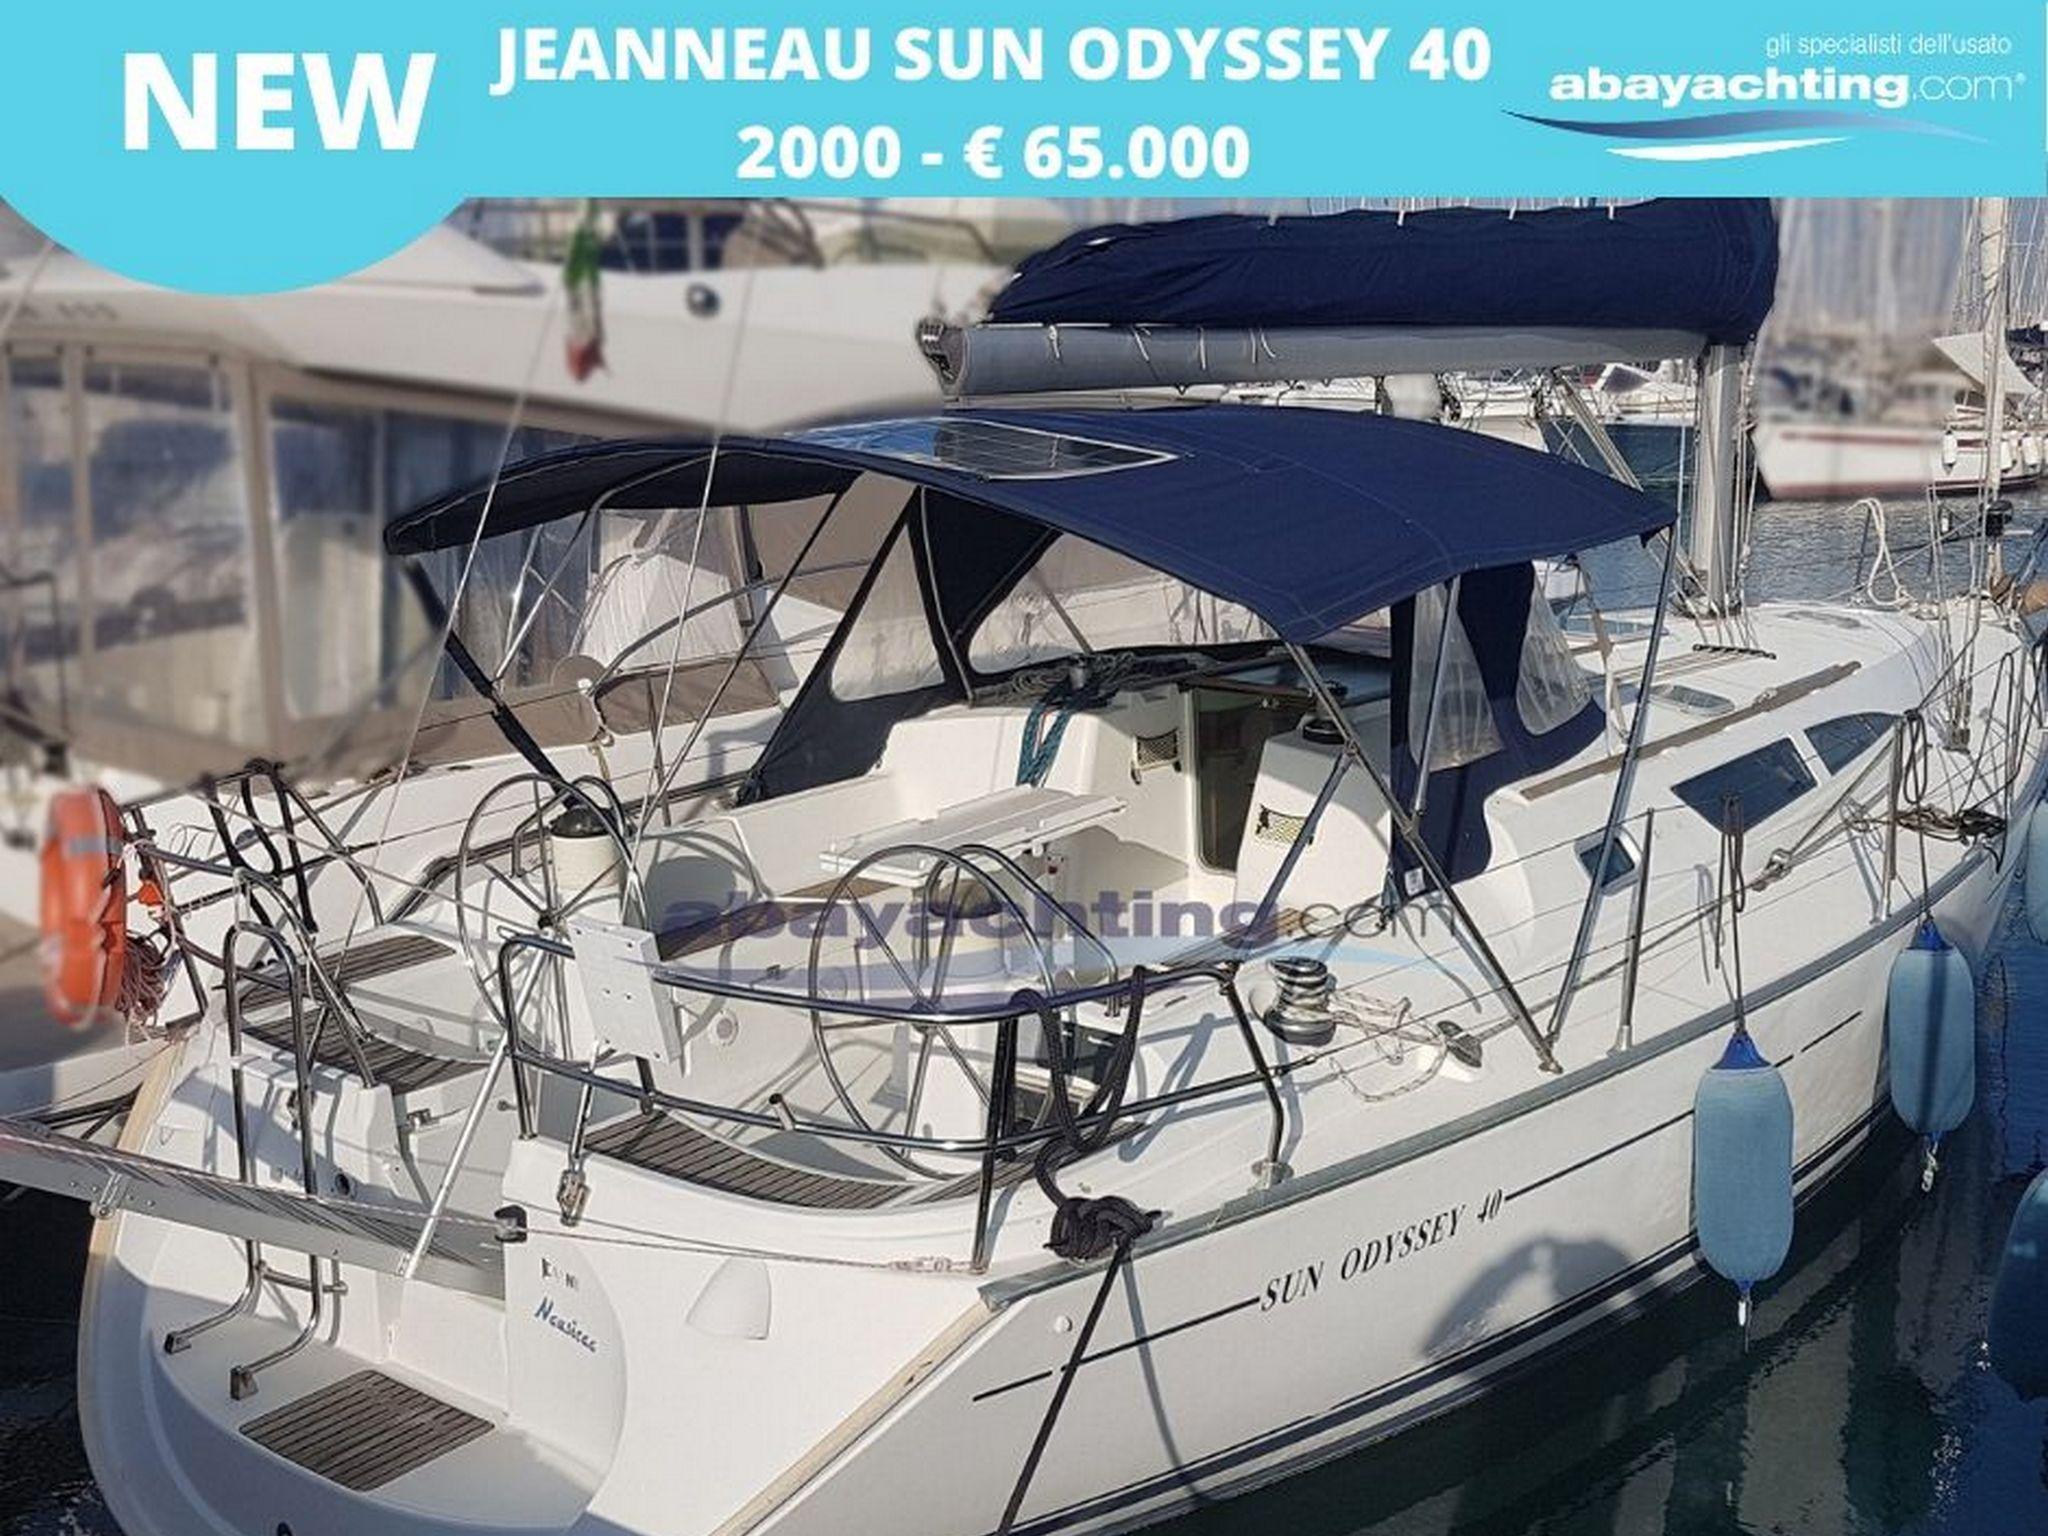 New arrival Jeanneau Sun Odyssey 40